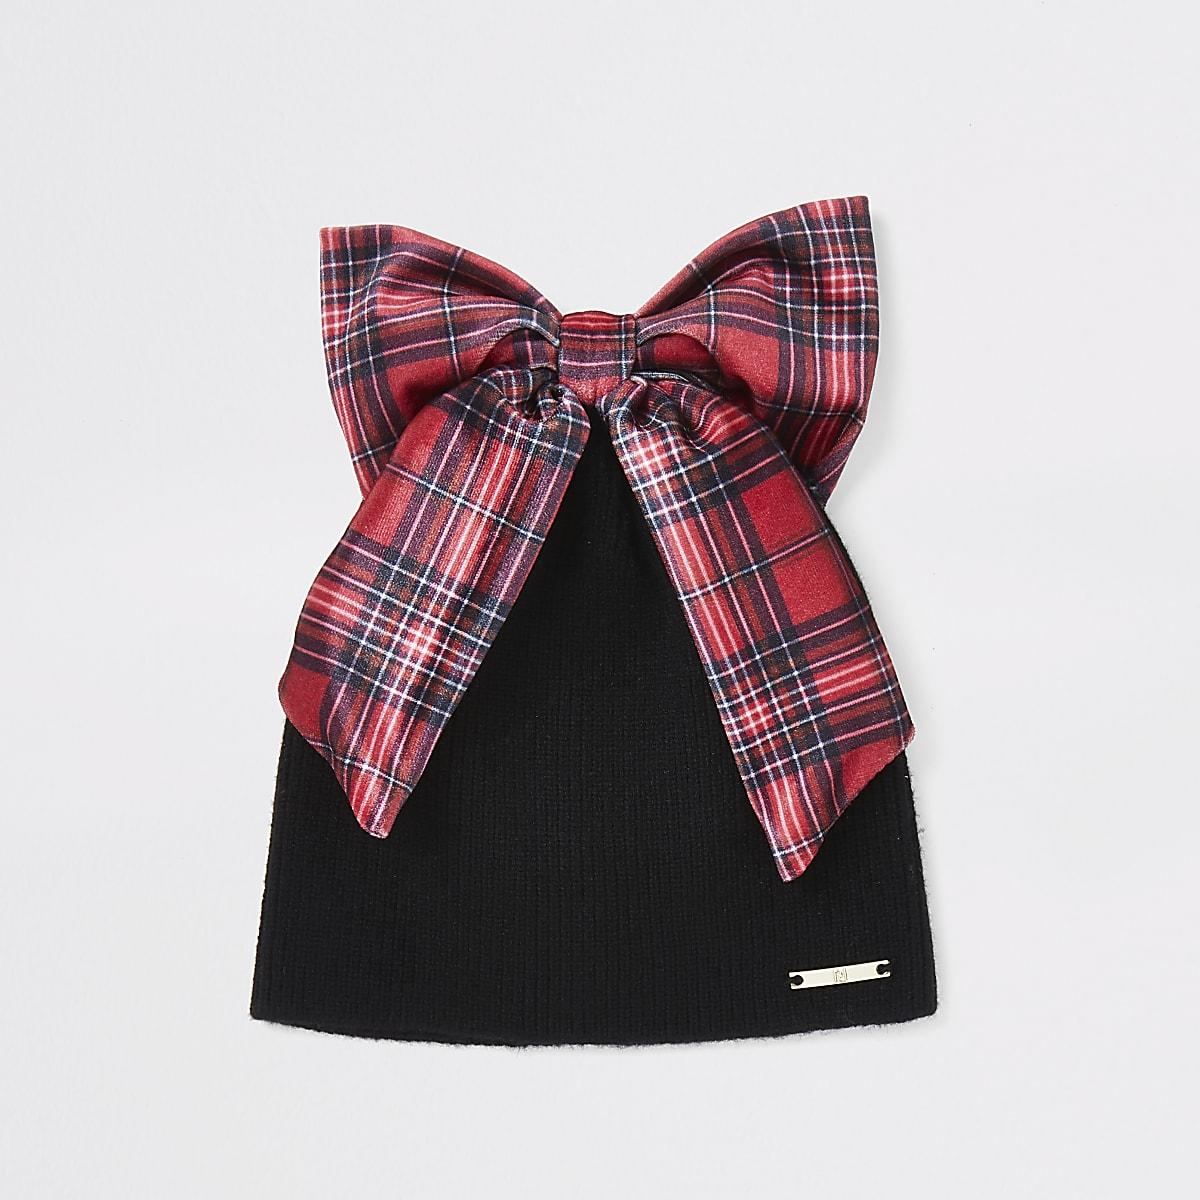 Girls black tartan bow knitted hat